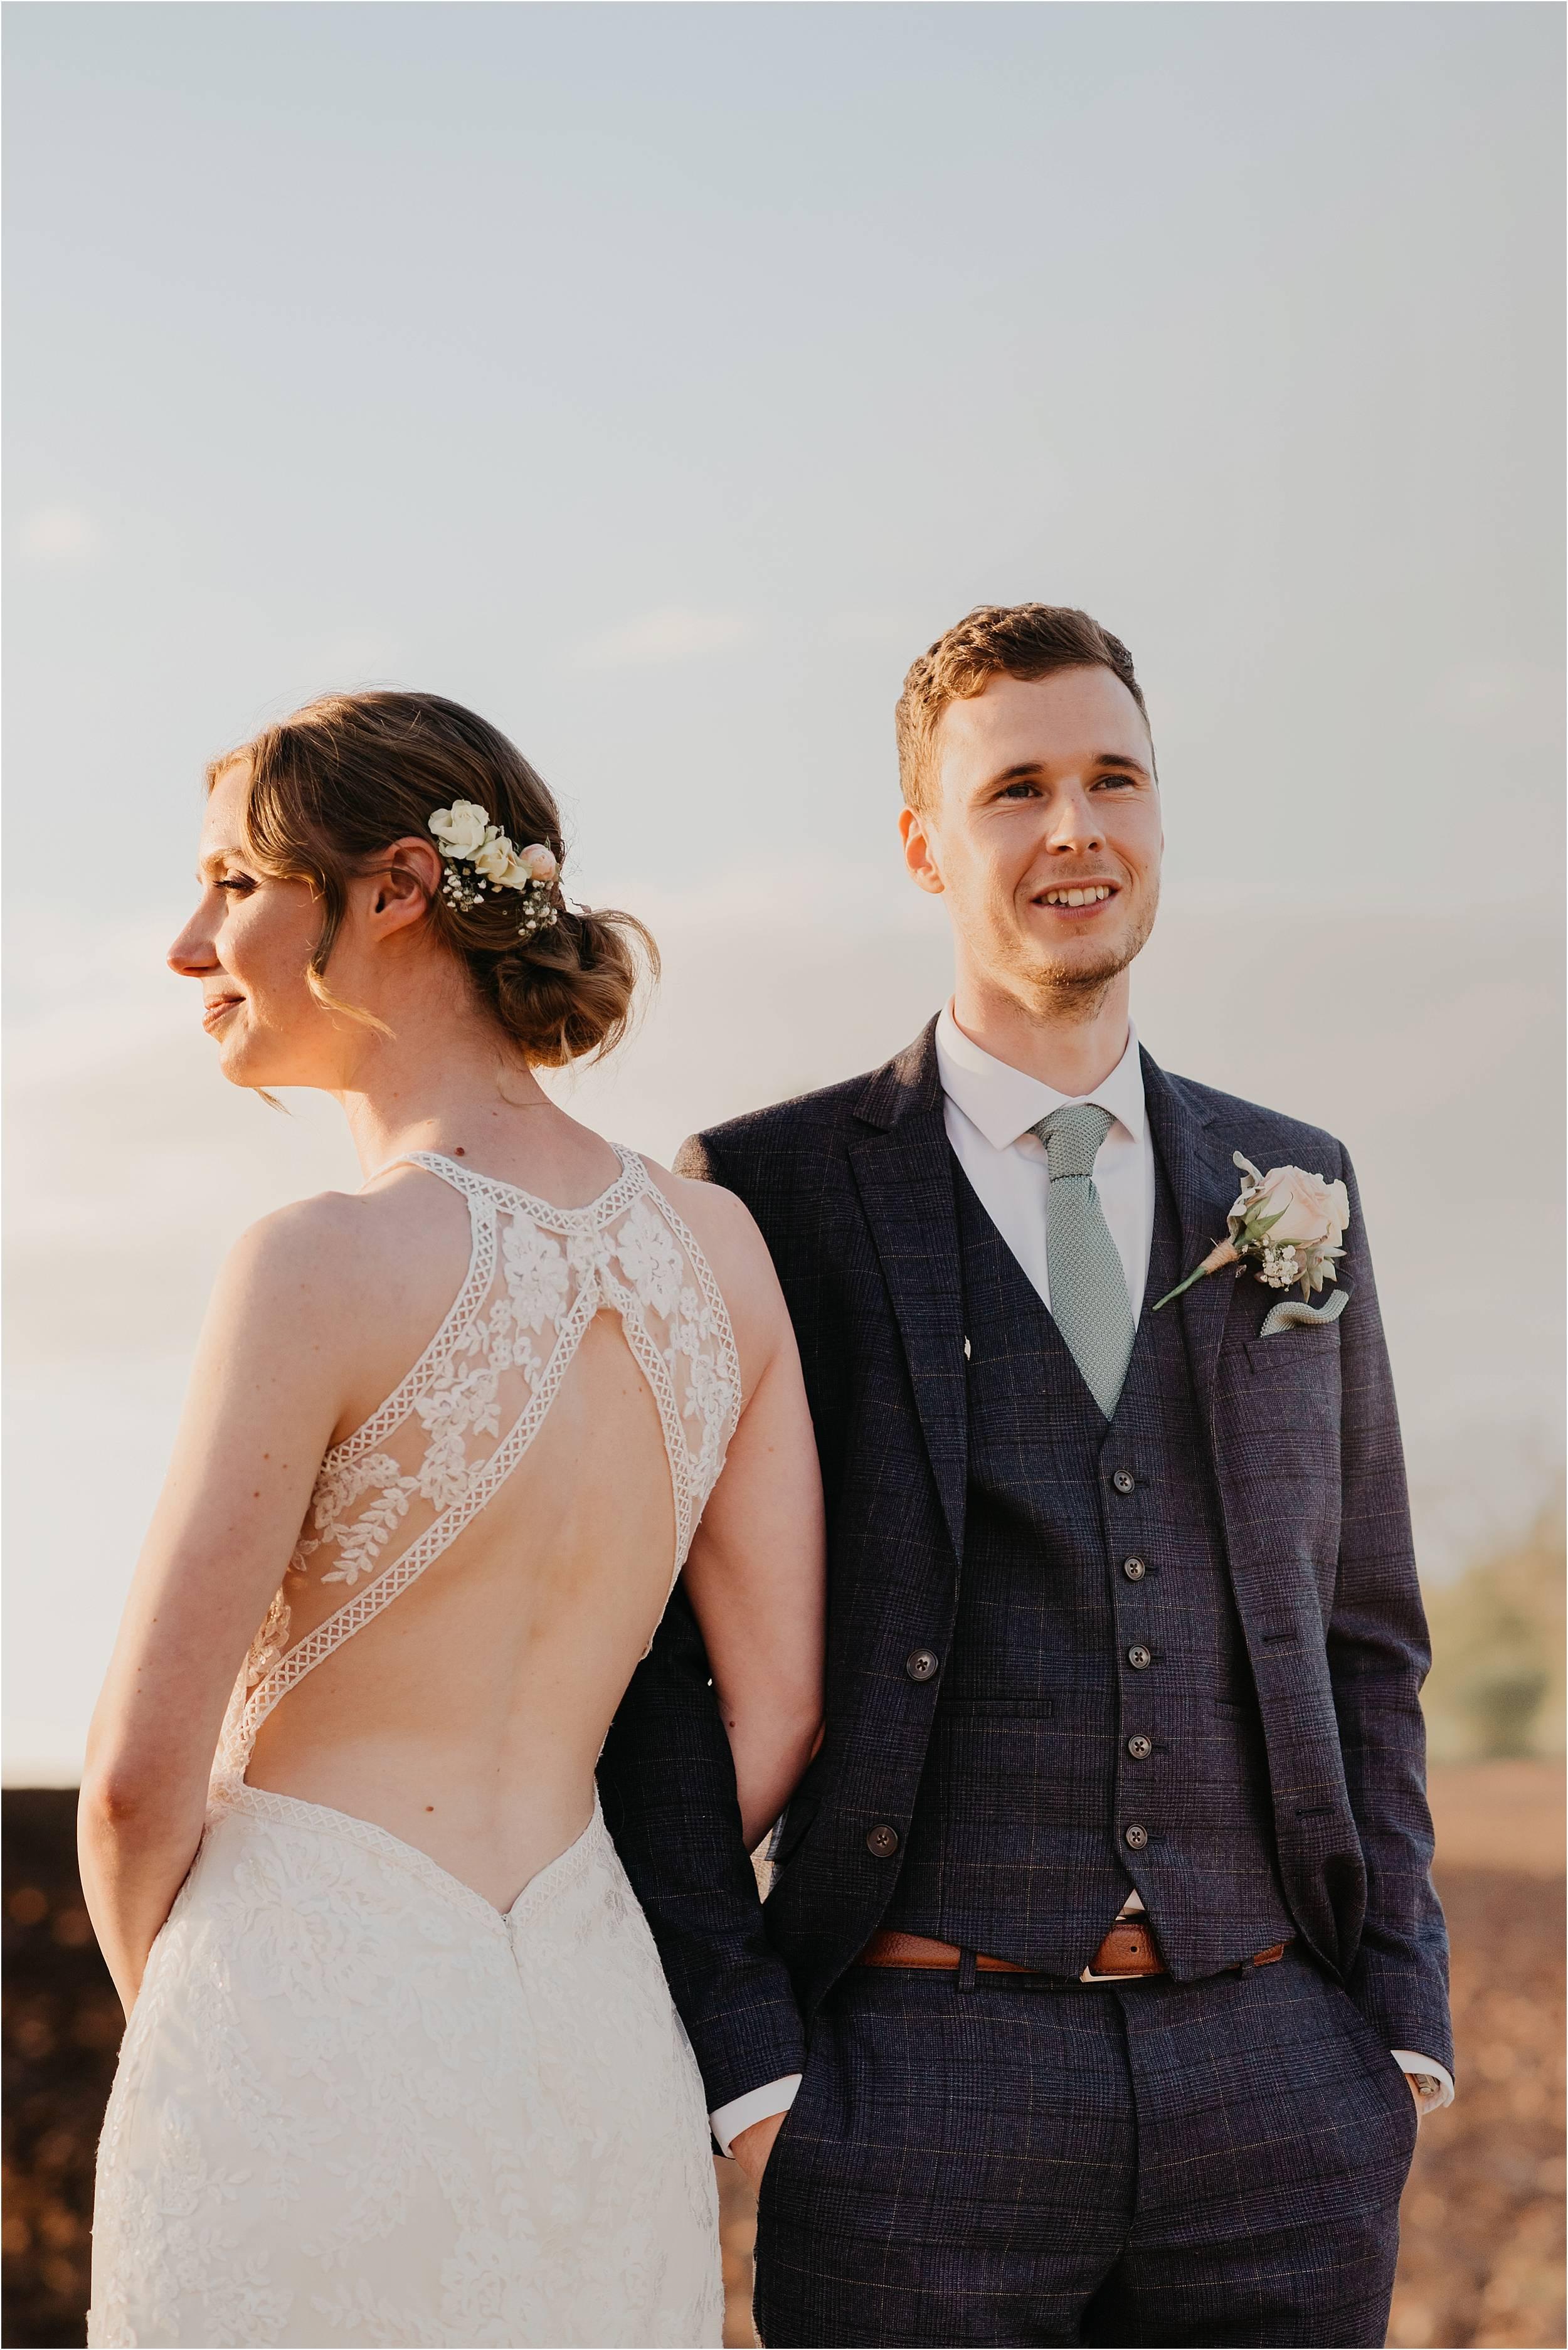 Kedleston Country House Wedding Photography_0097.jpg